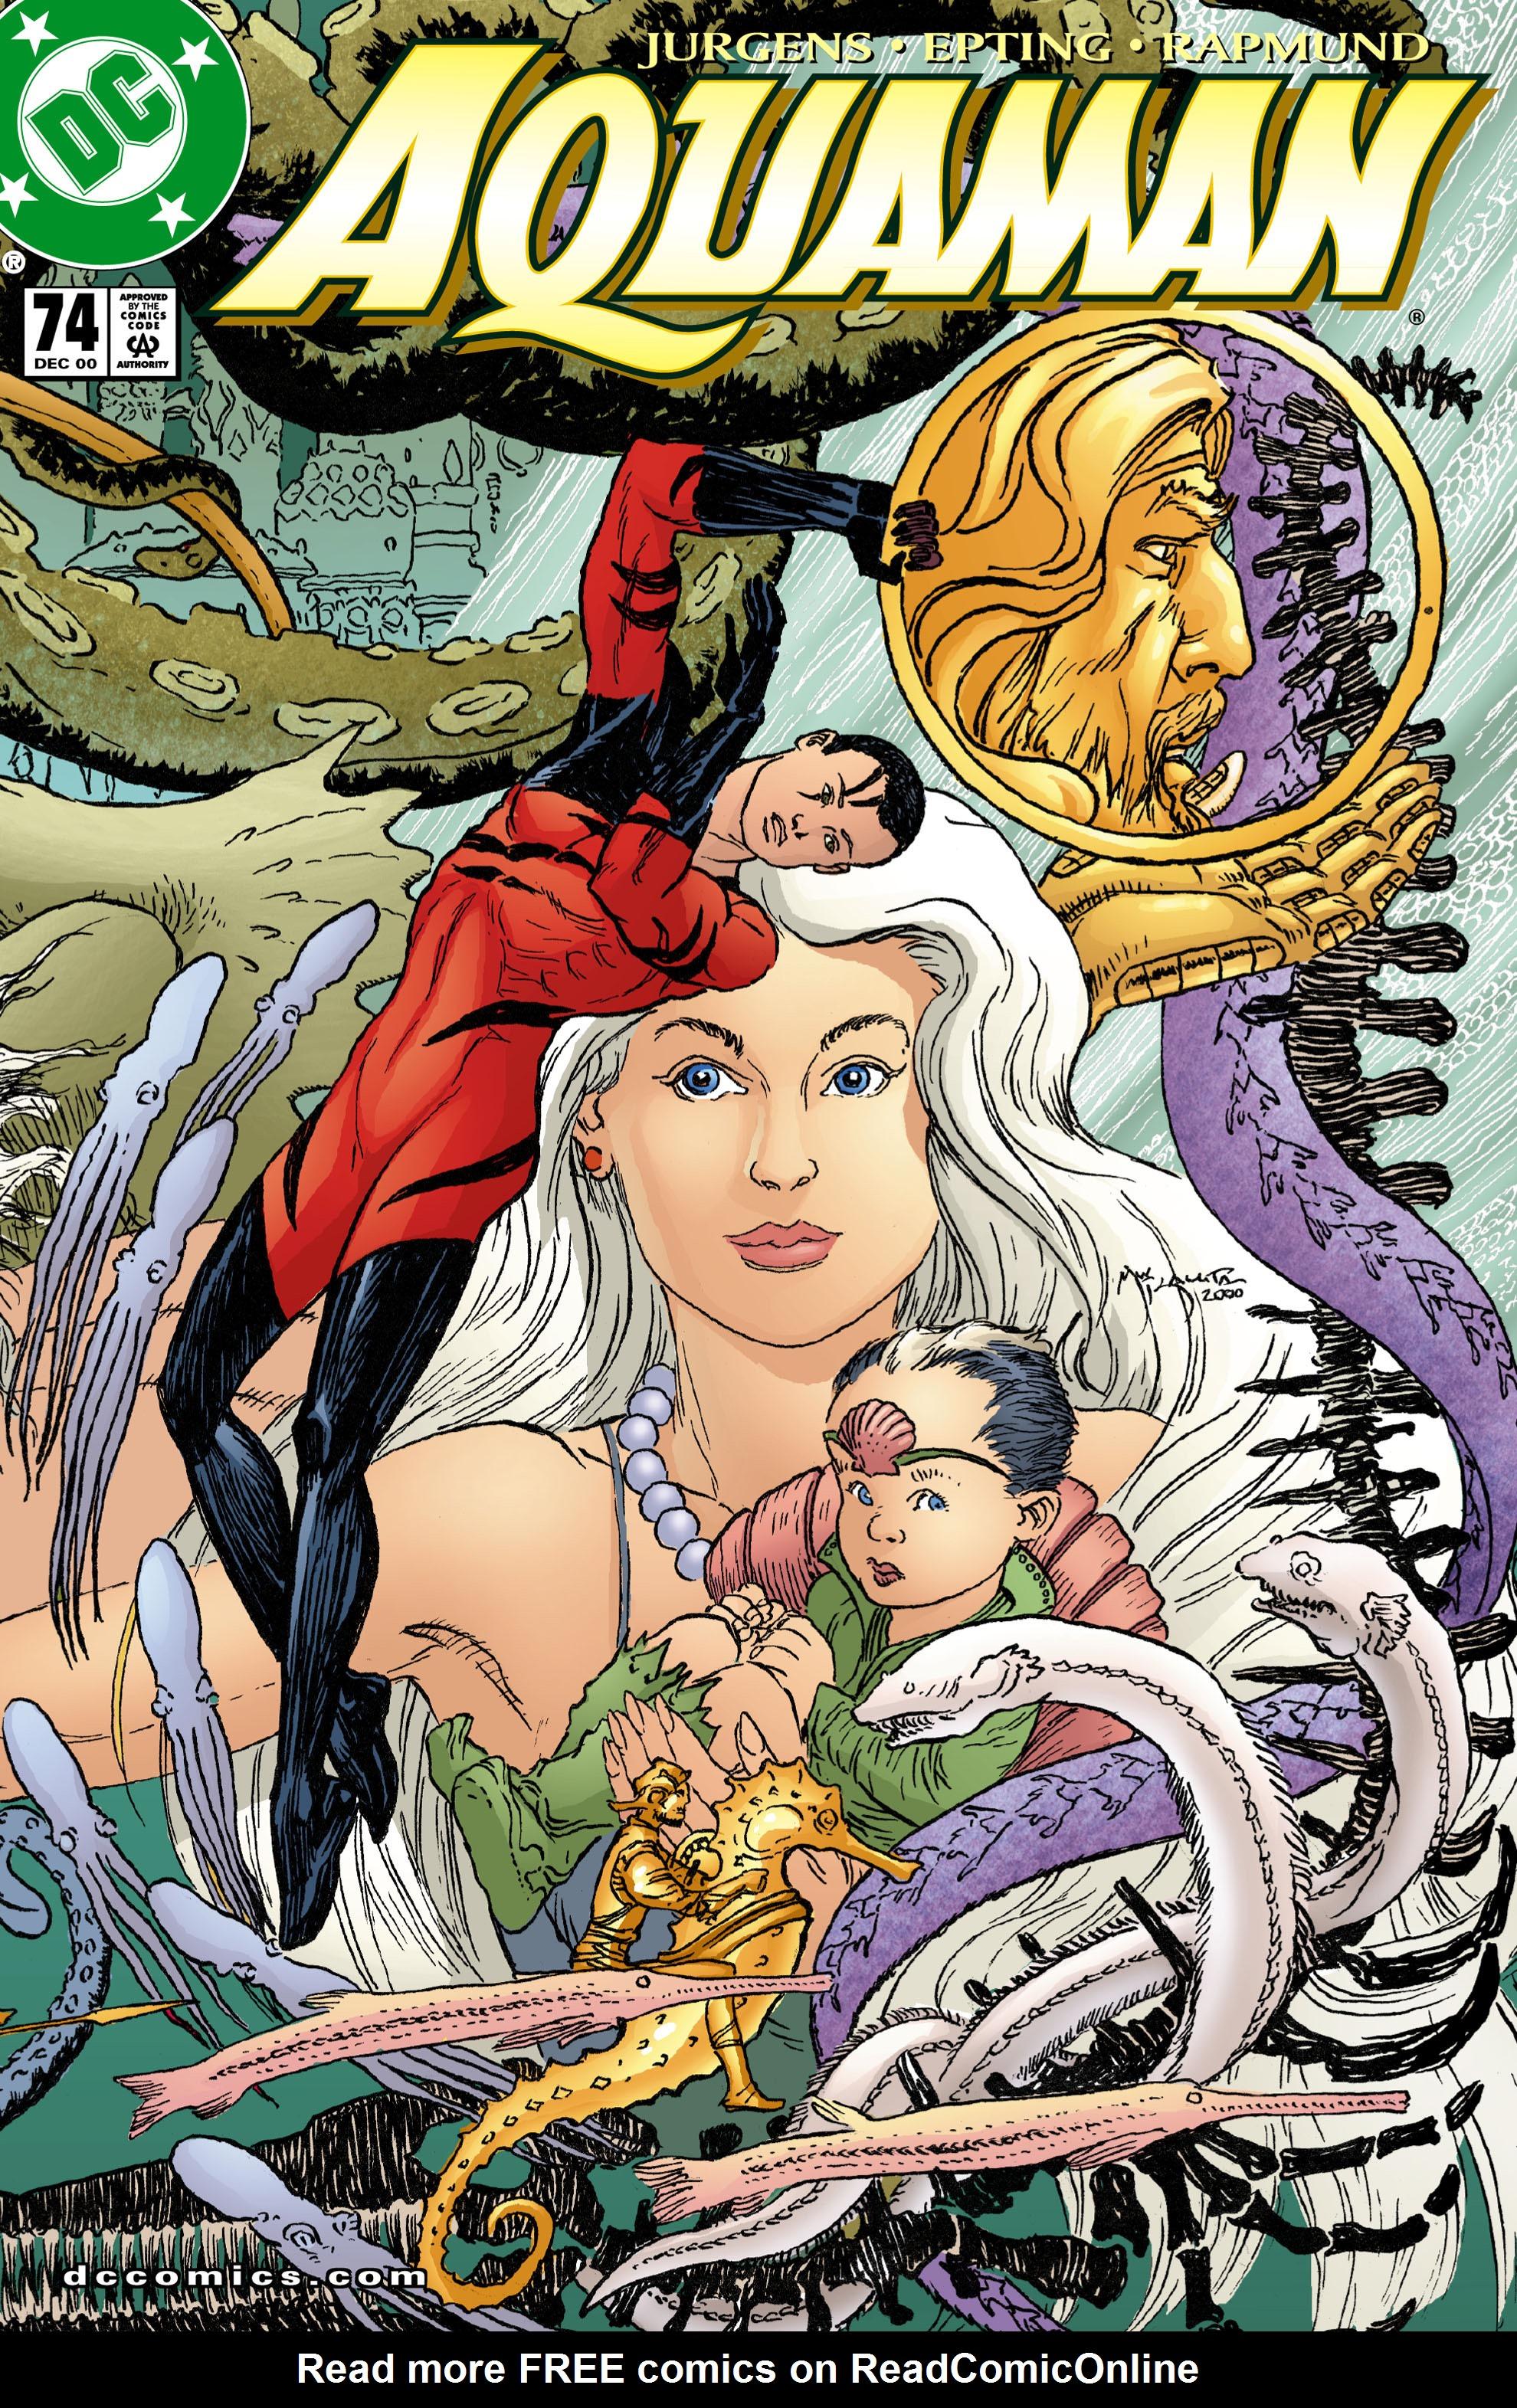 Read online Aquaman (1994) comic -  Issue #74 - 1